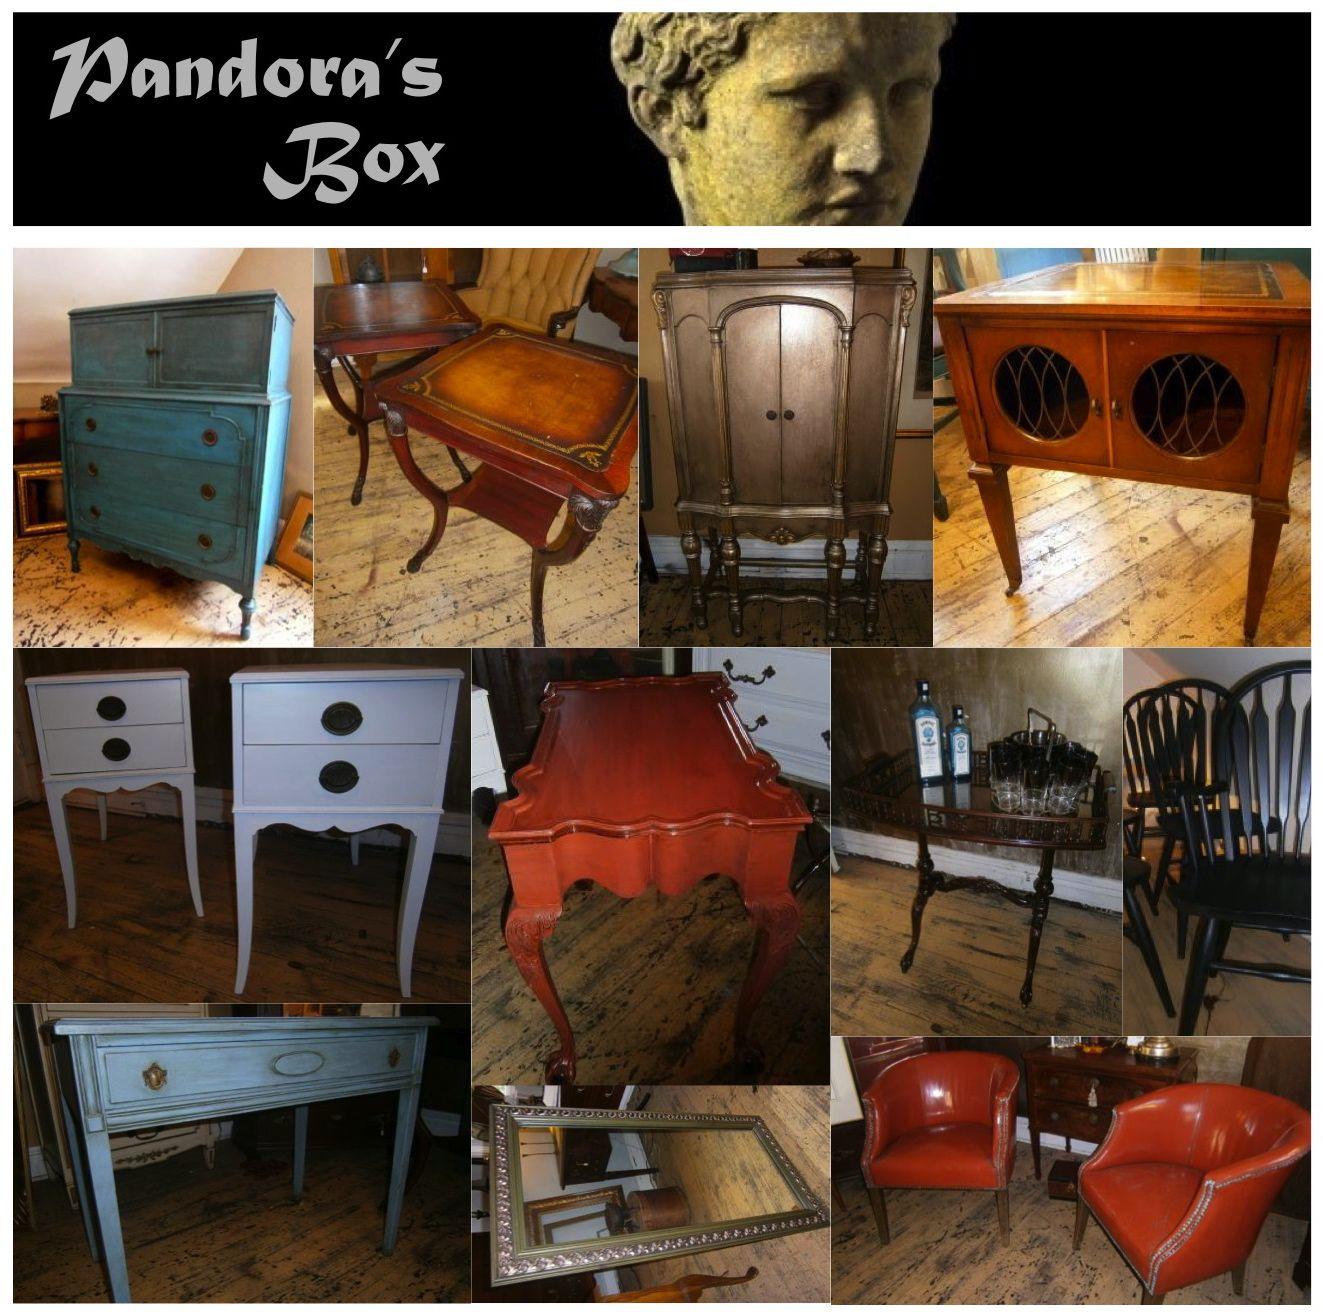 Featured Chicago Store - Pandora's Box